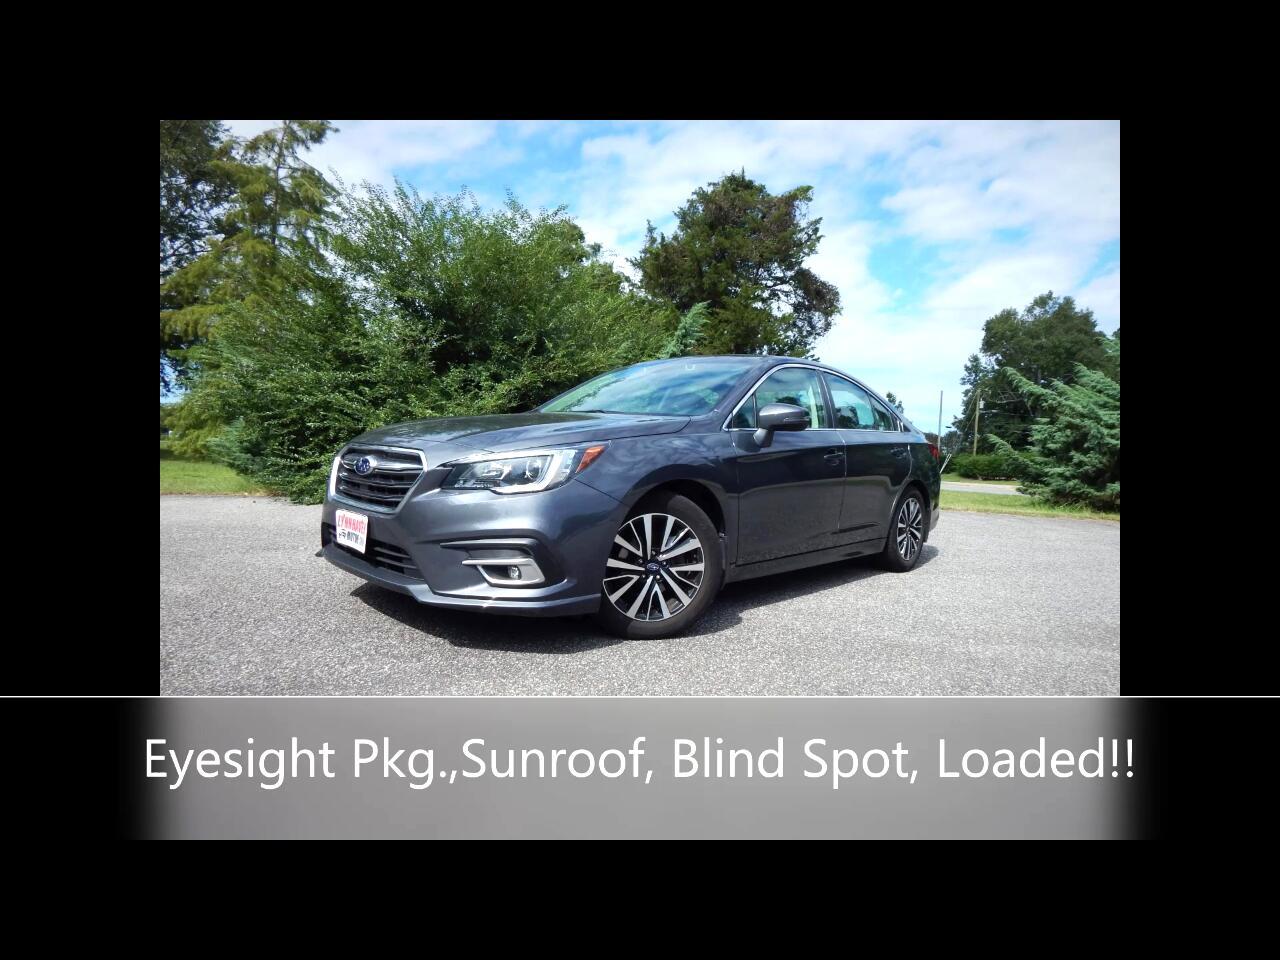 Subaru Legacy 4dr Sdn H4 Auto 2.5i Prem AWP/Pwr Moon 2018